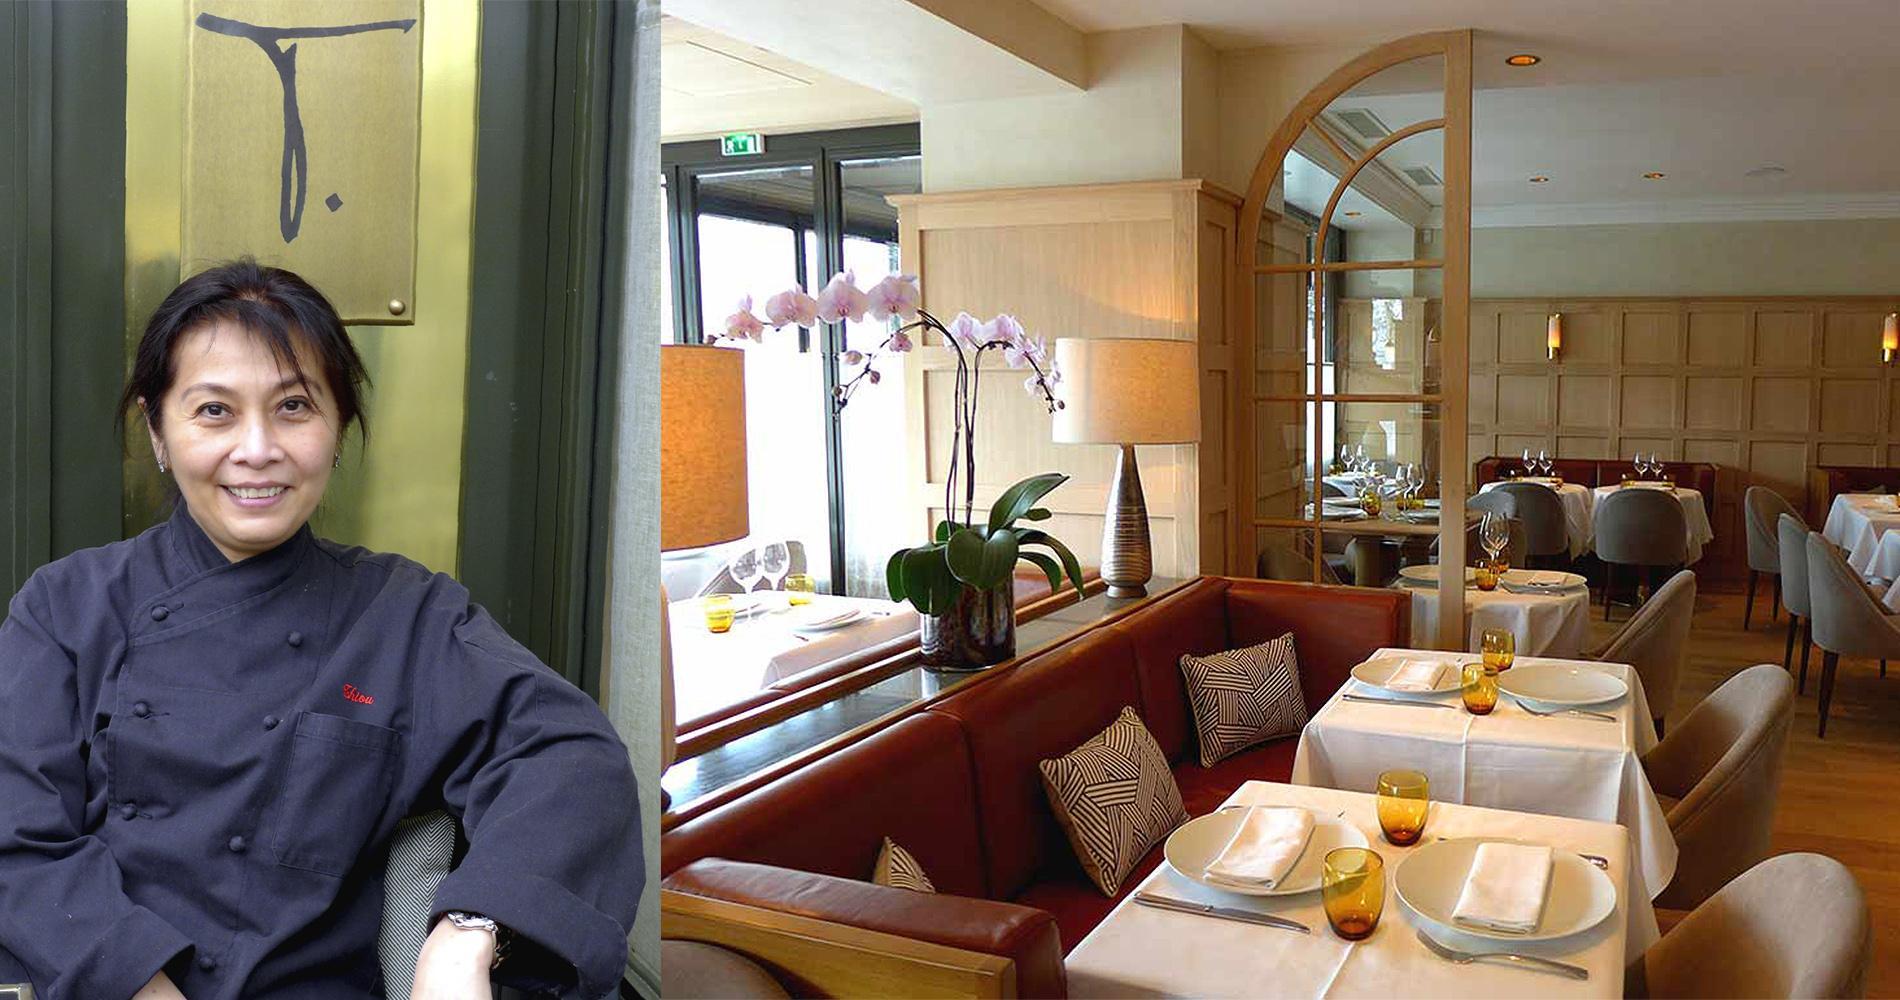 Coup de food au restaurant thiou cuisine madame figaro - Restaurant thiou paris ...